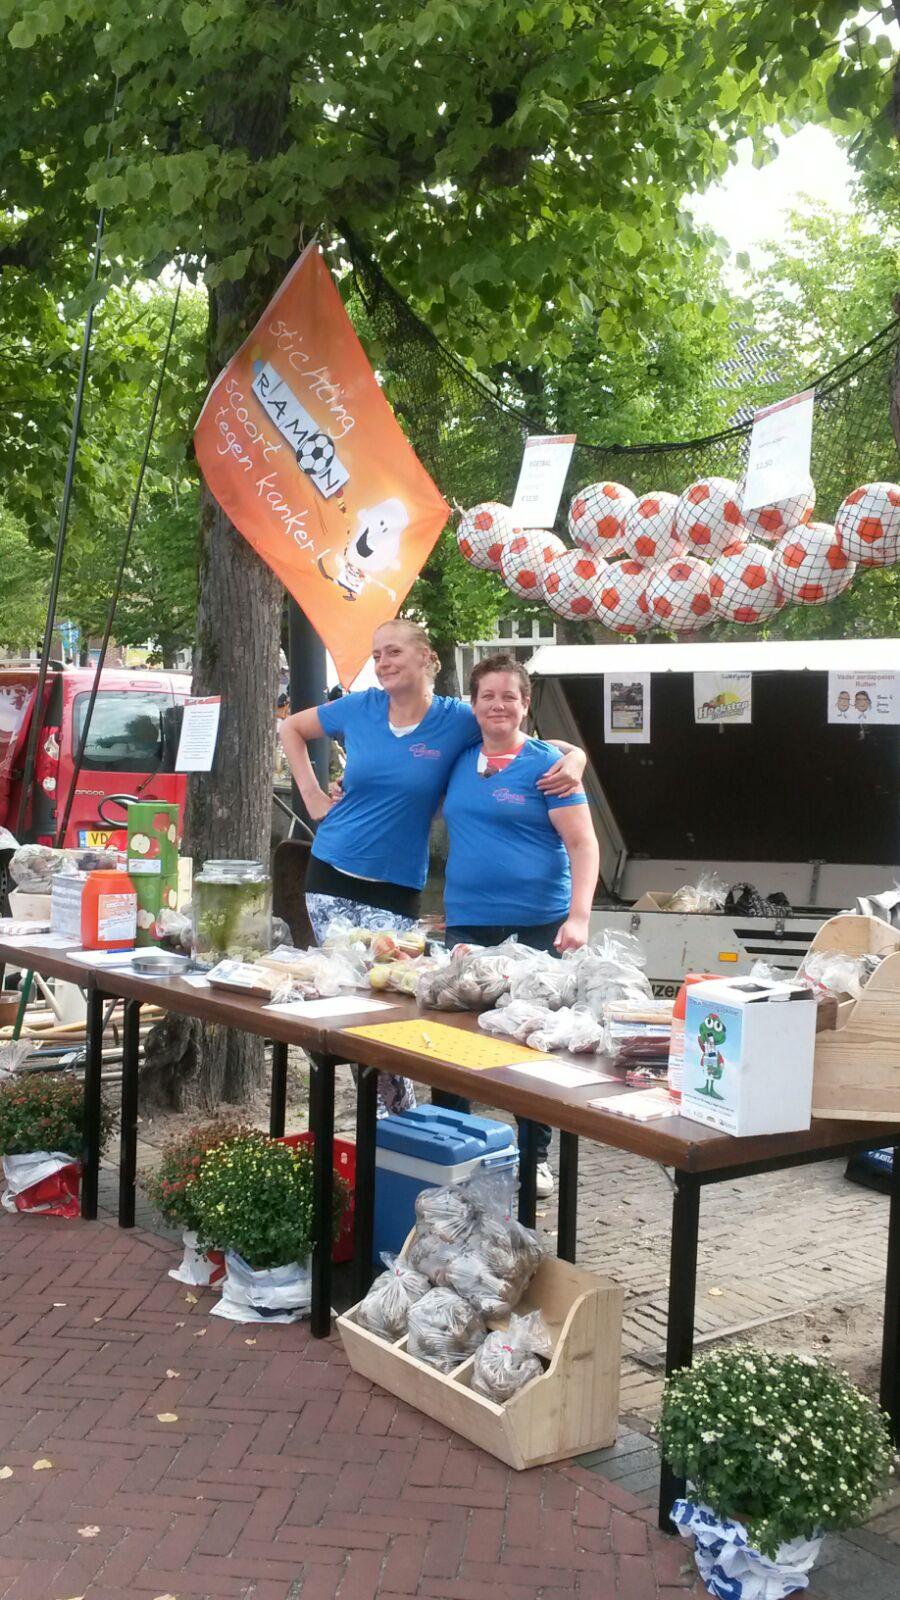 Ramon scoort tegen kanker Poppodium vrijmarkt Balk foto 4.jpg